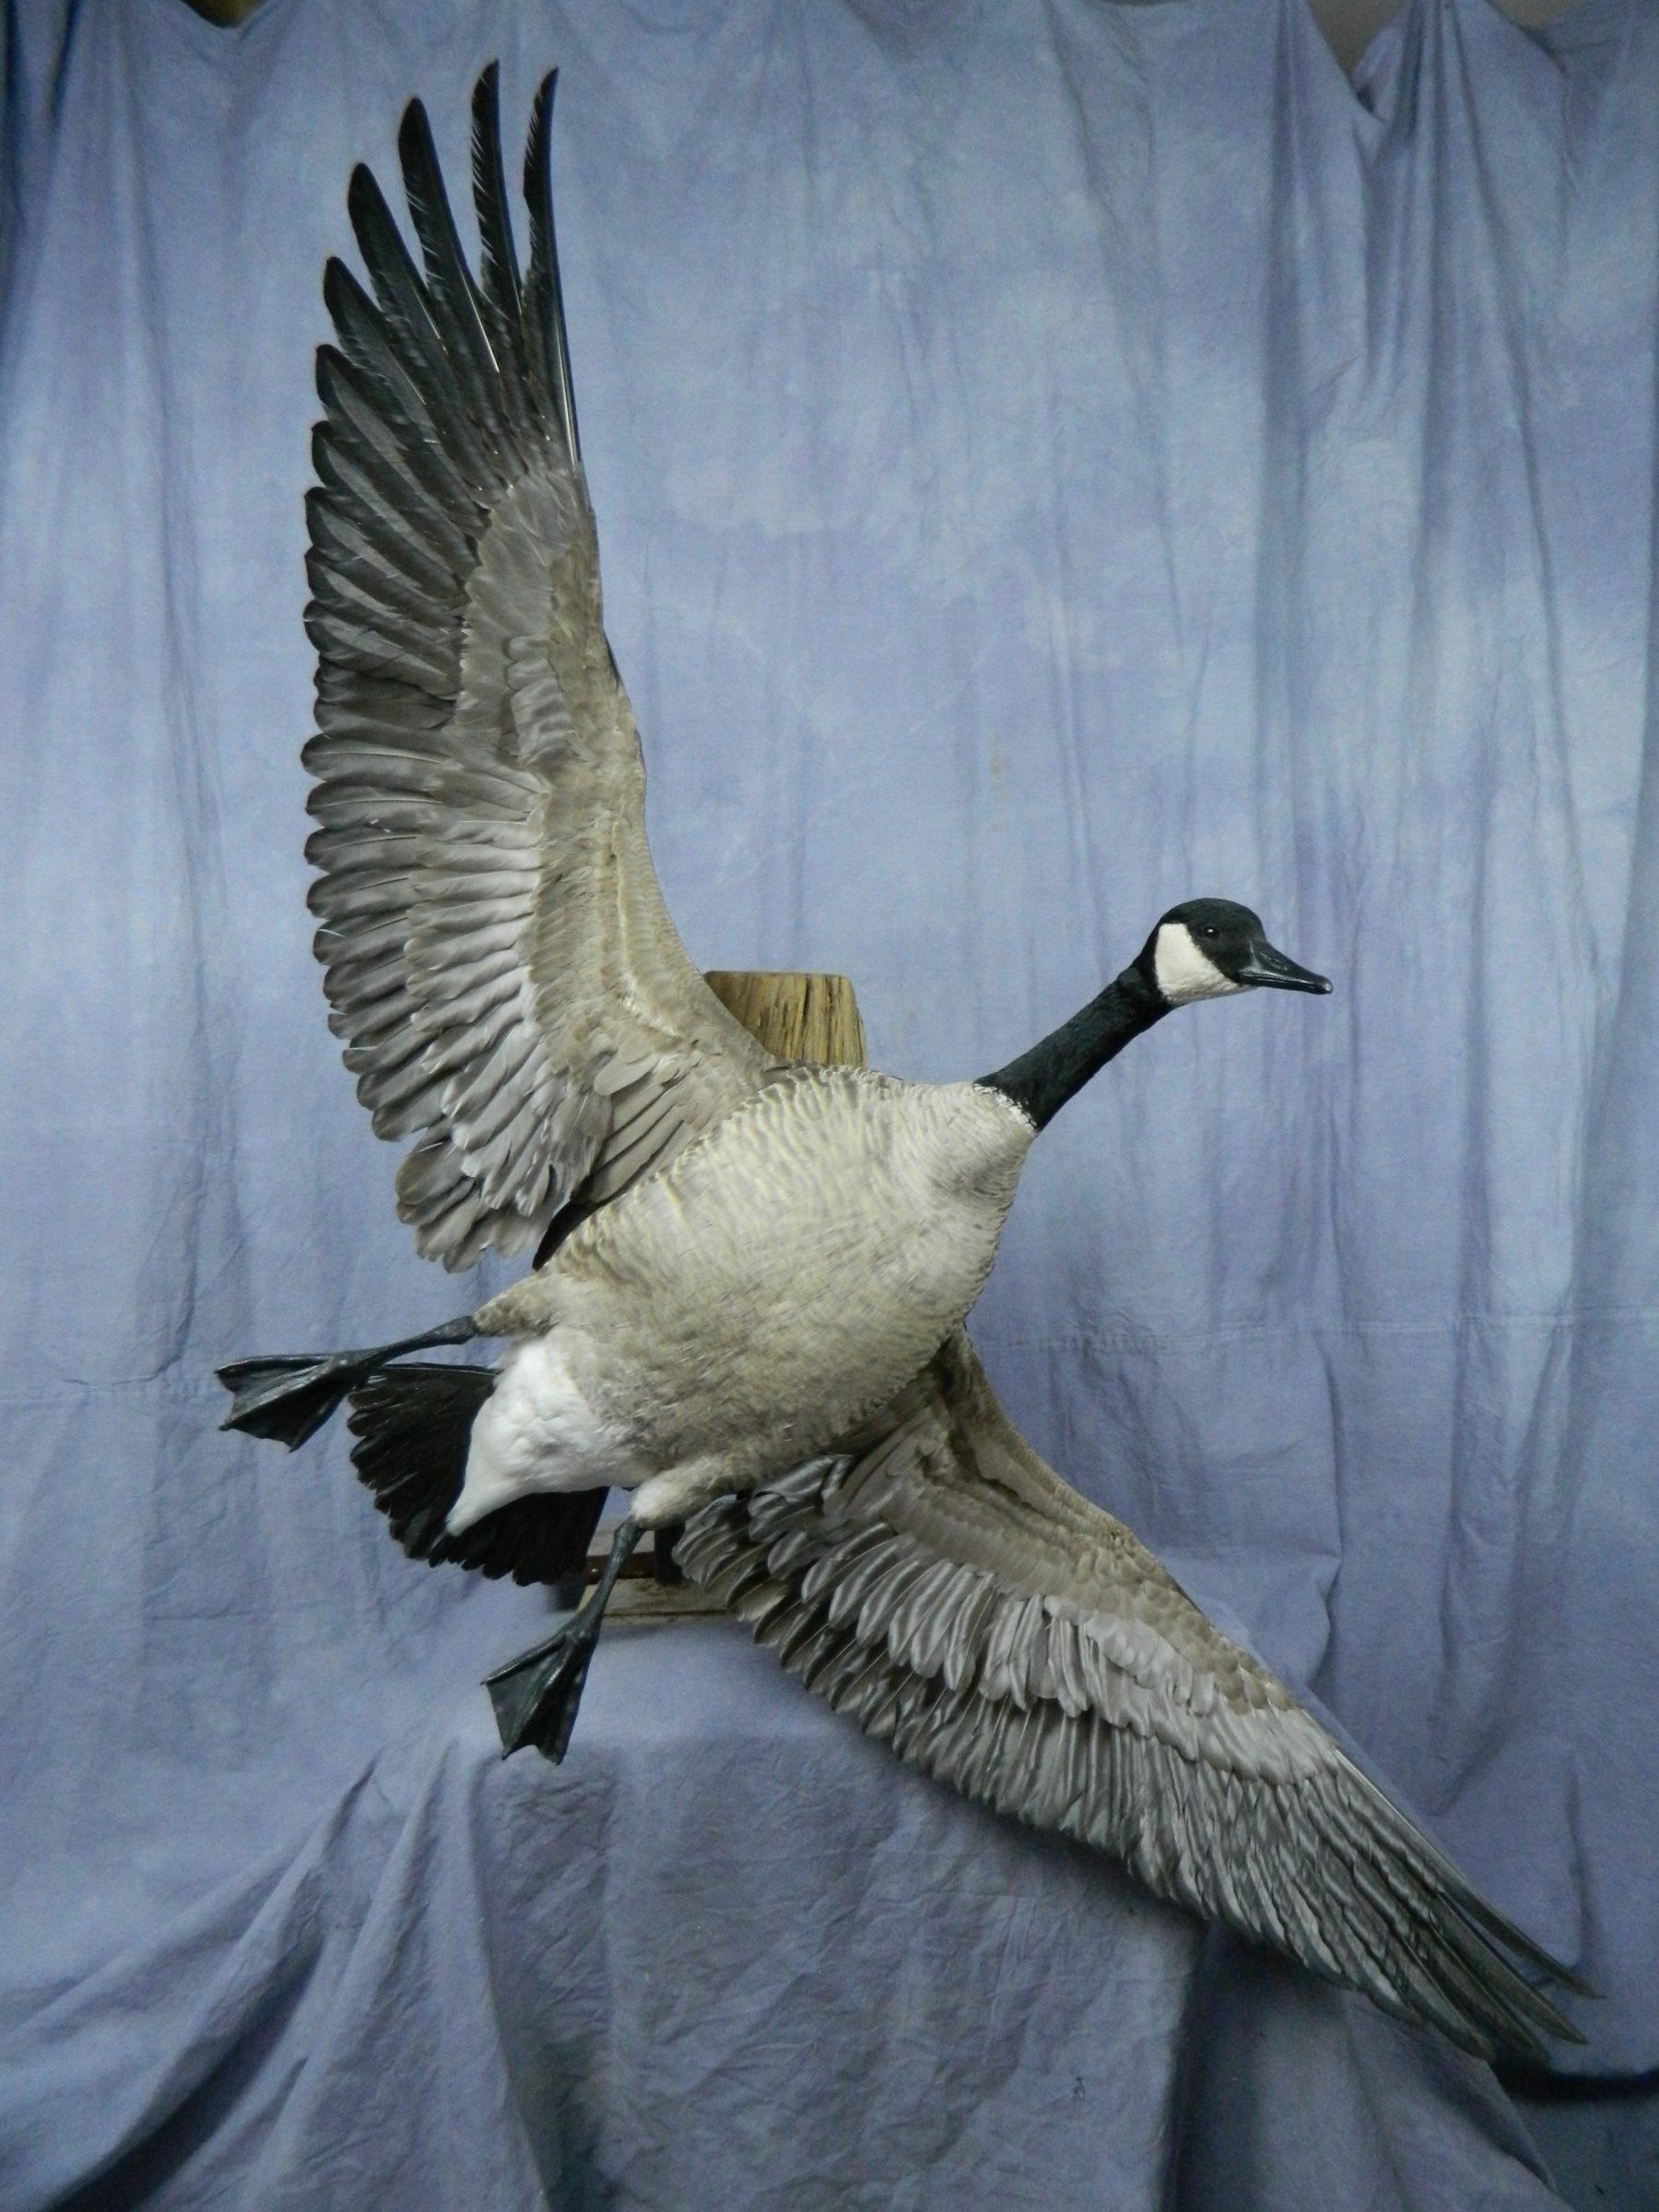 doudoune 3 en 1 du Canada goose drummond pas cher